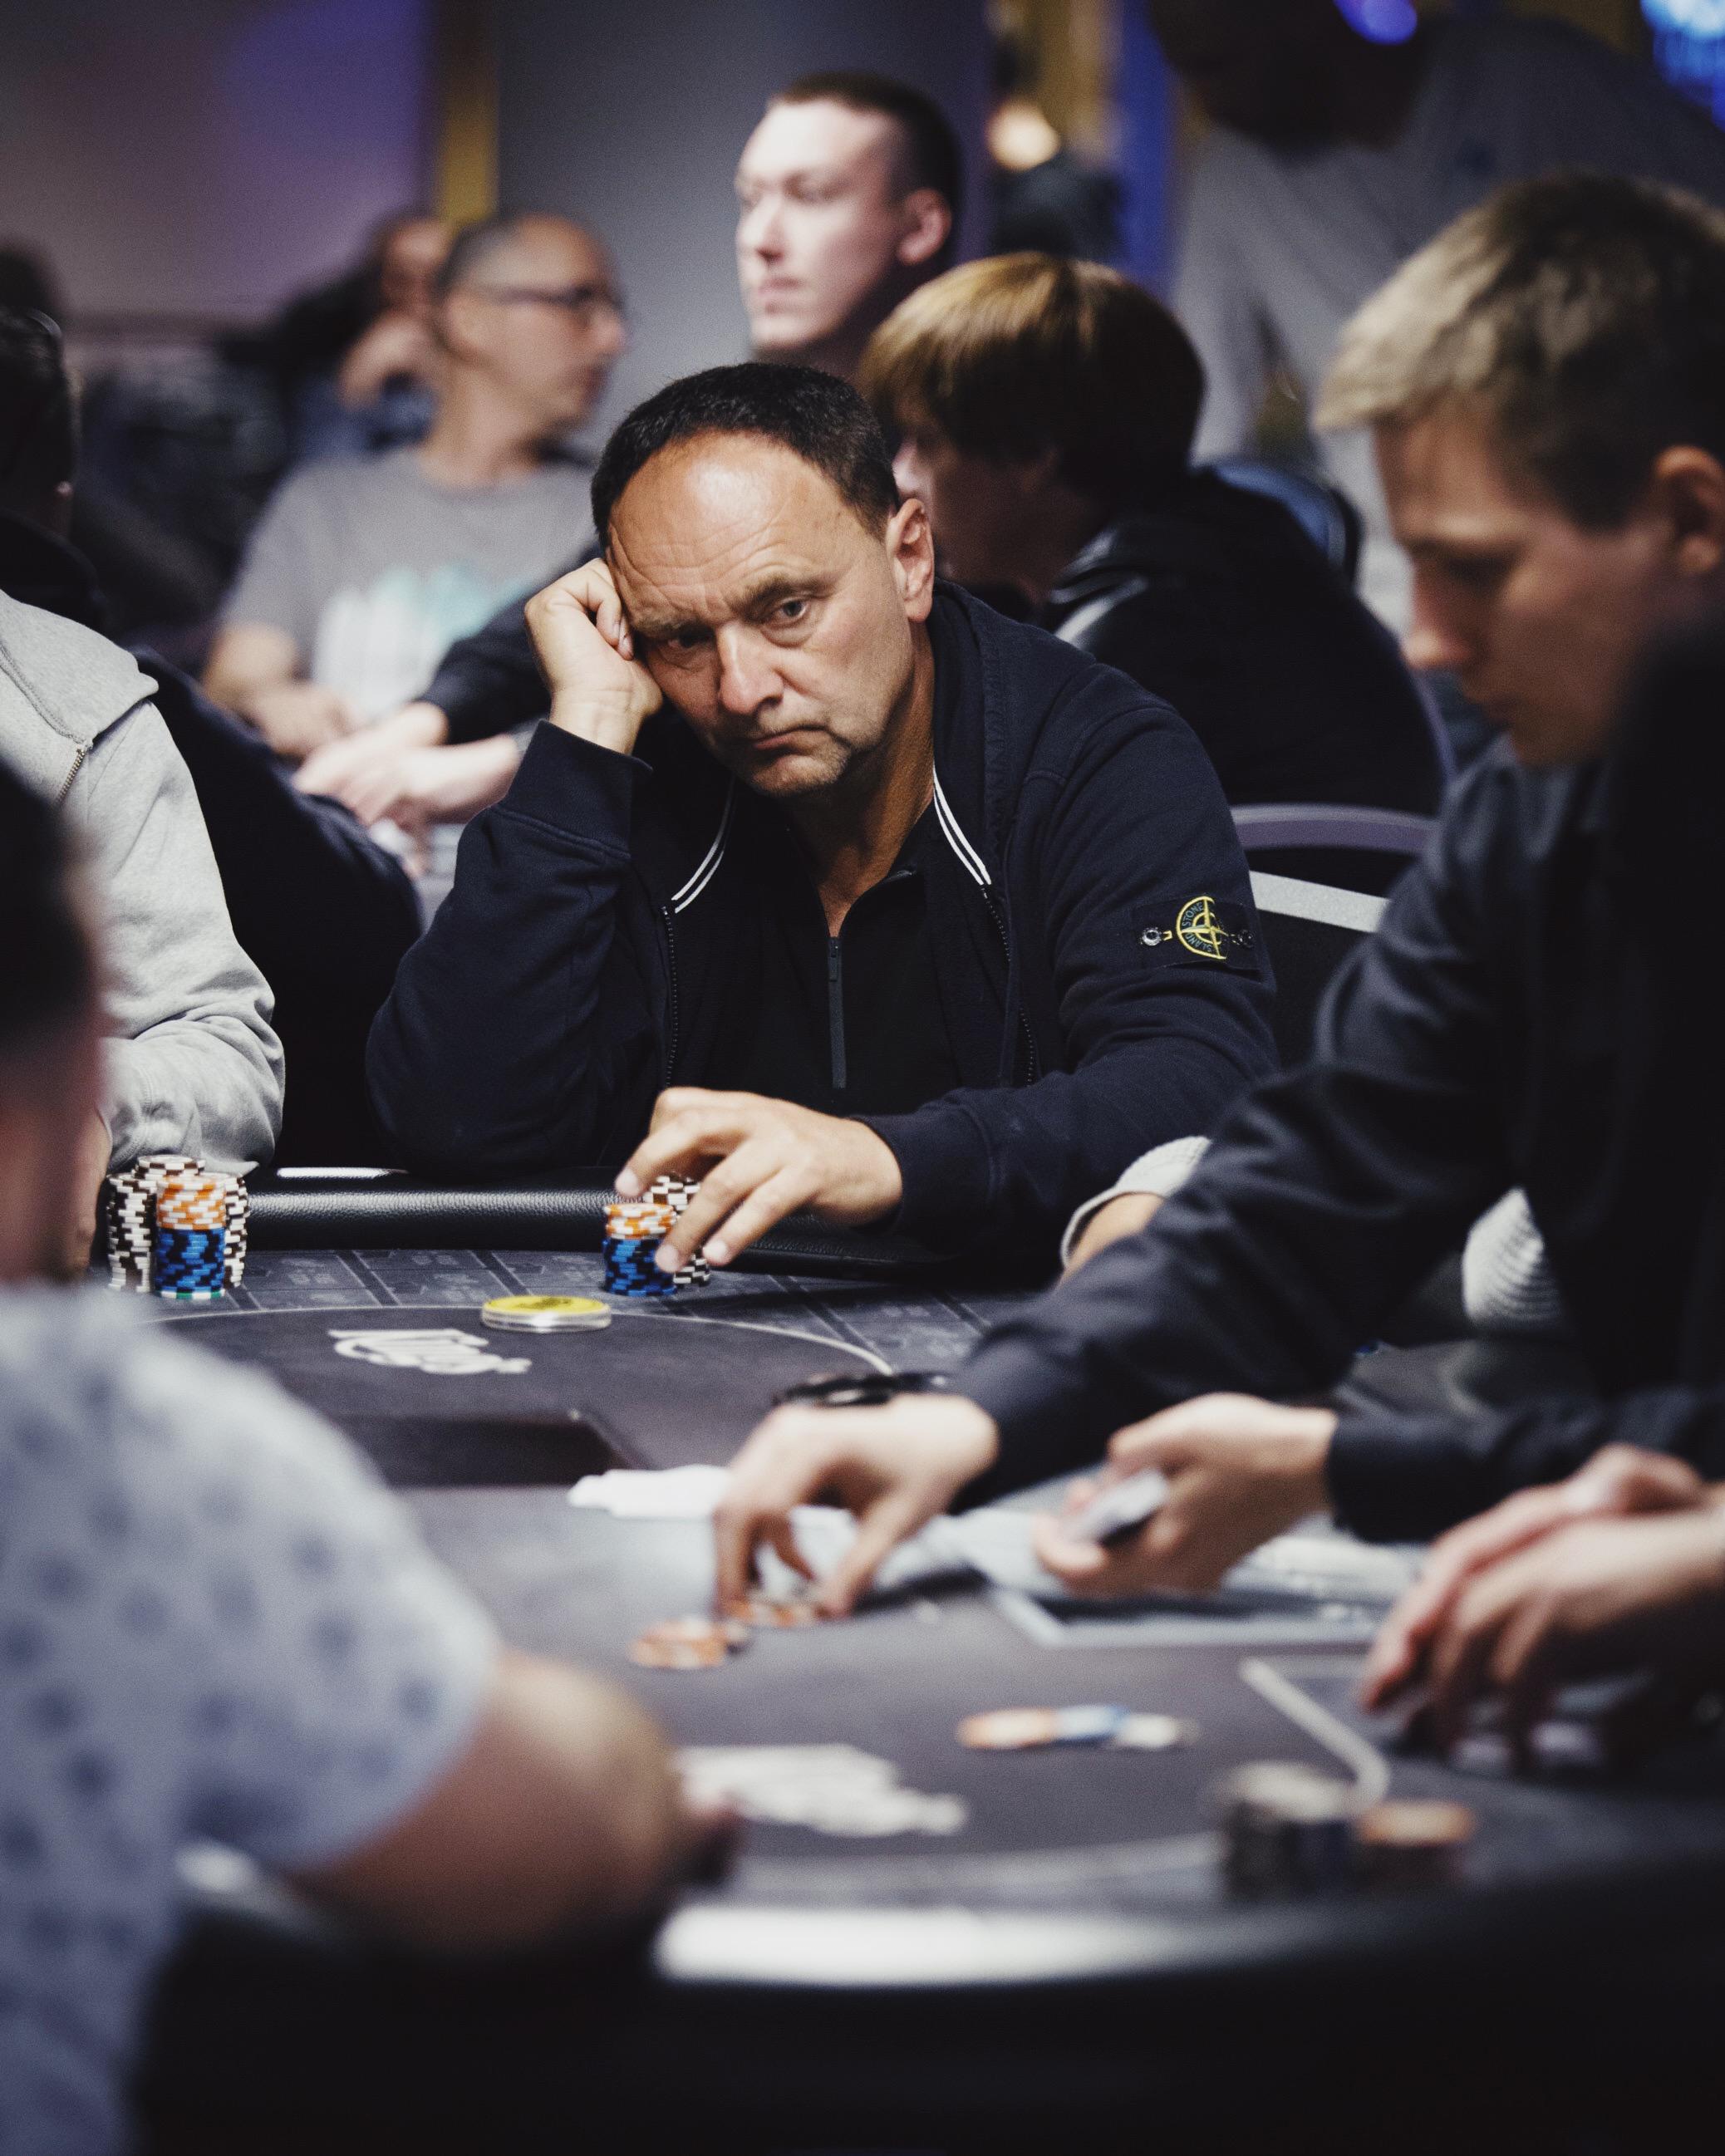 polina-shubkina-poker-006.JPG